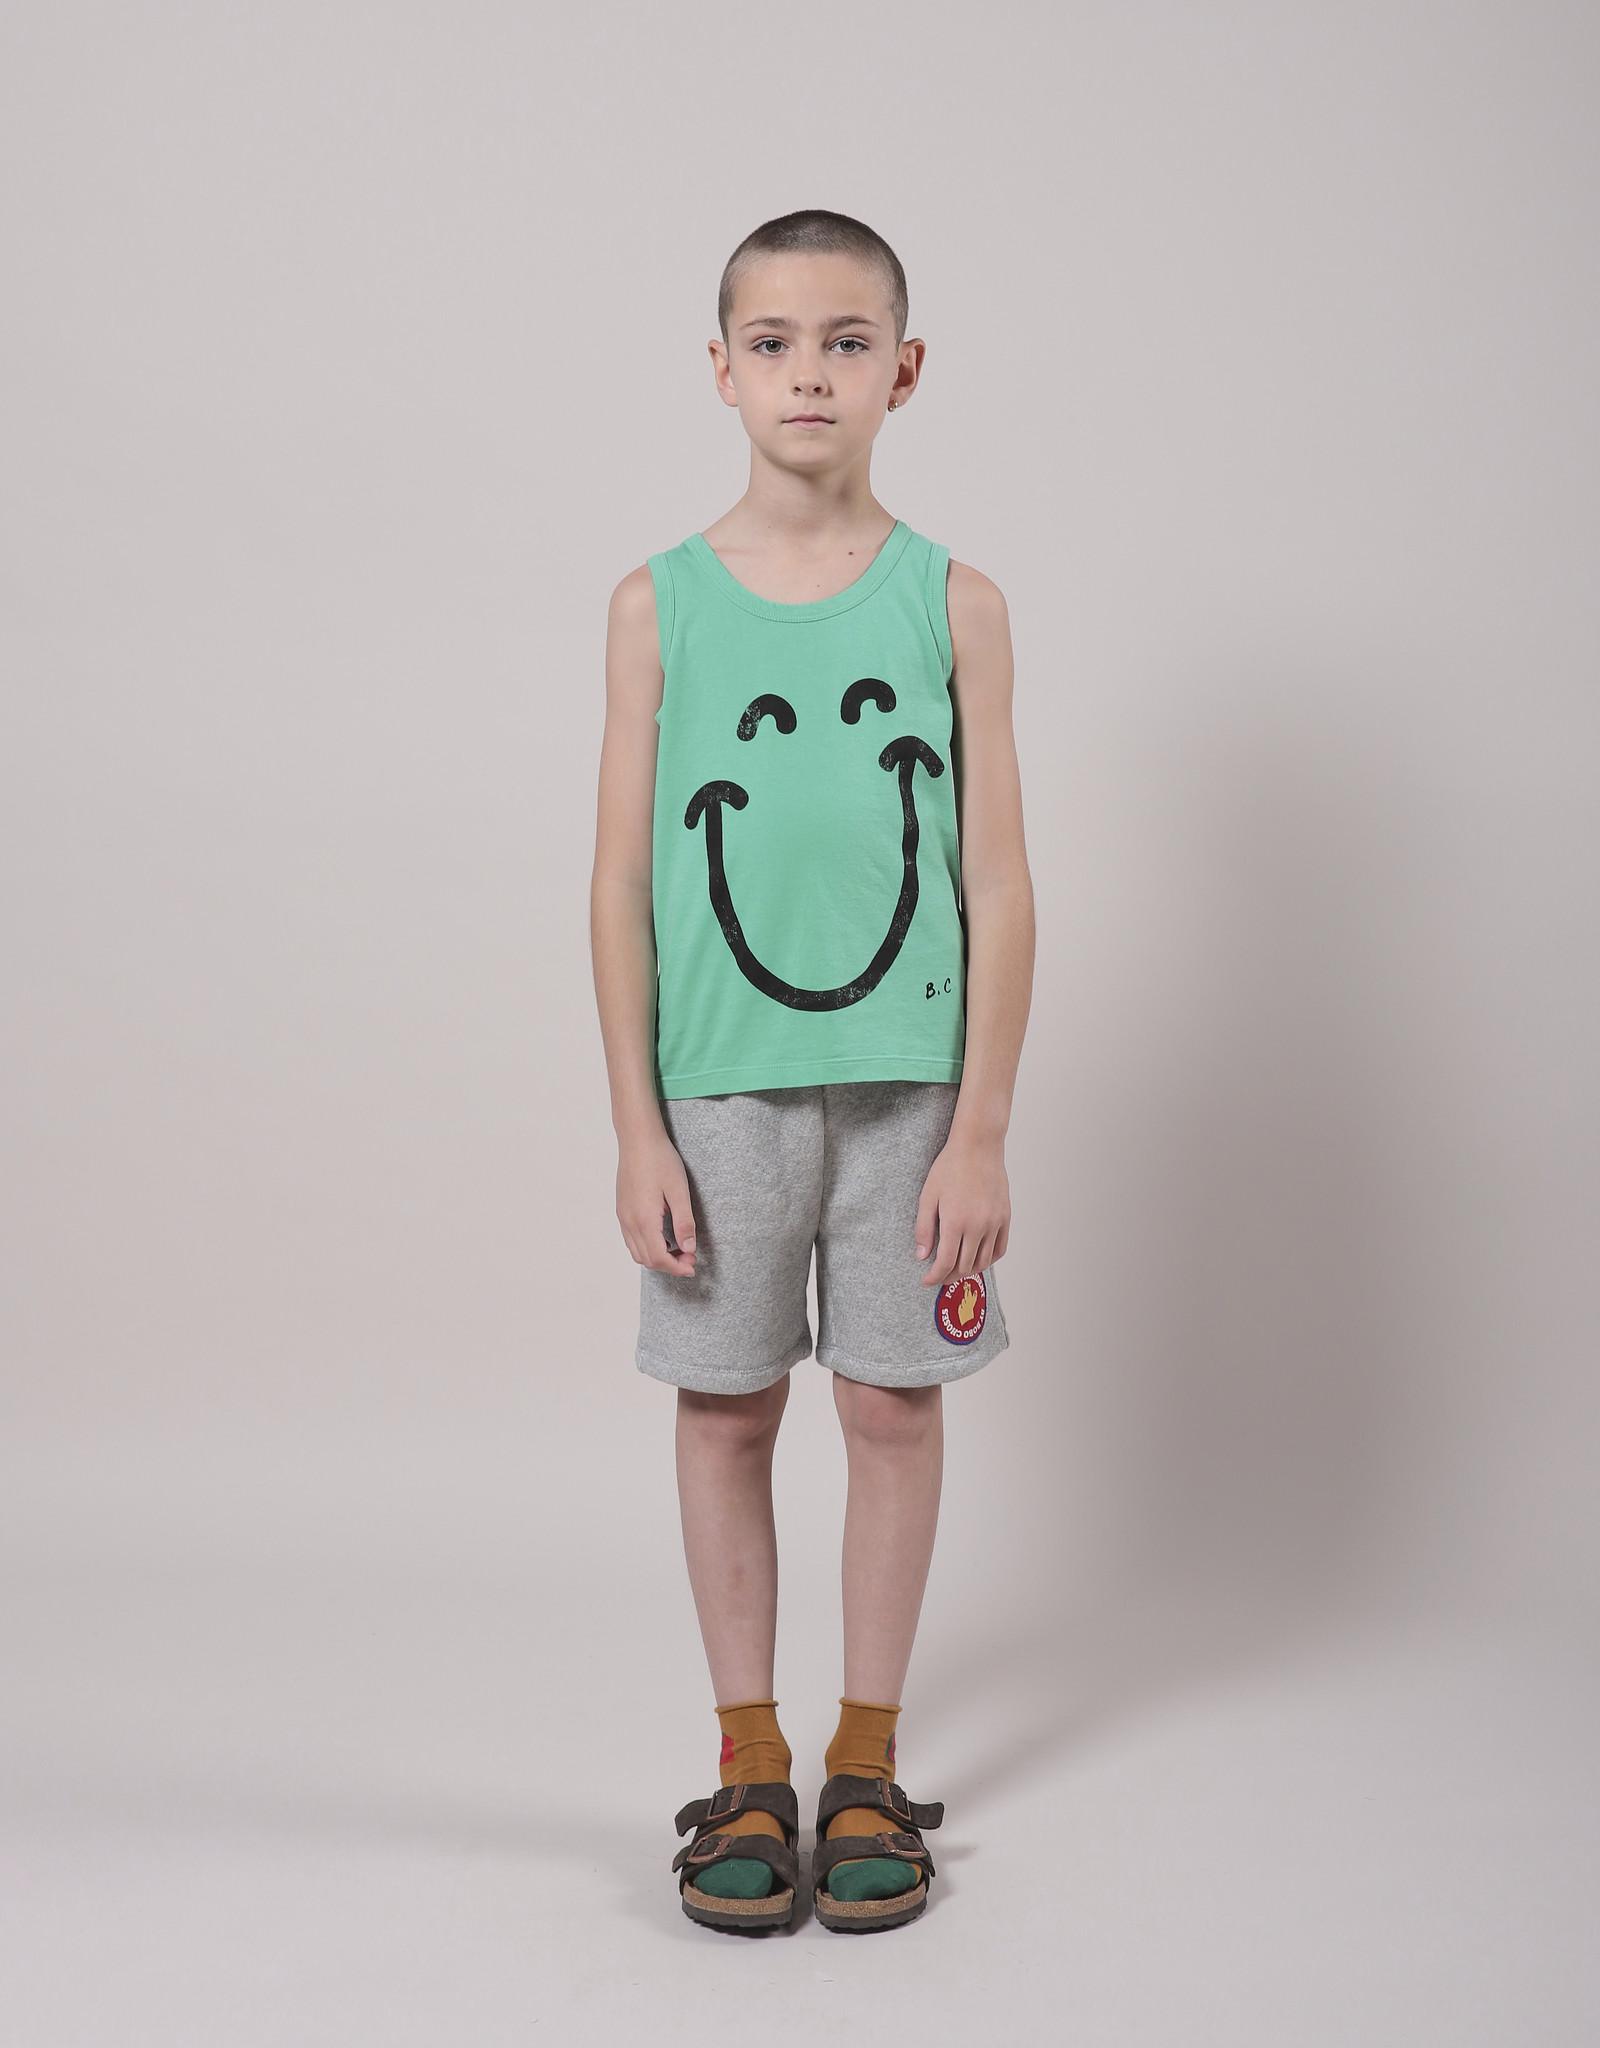 Bobo Choses Big Smile Tank Top